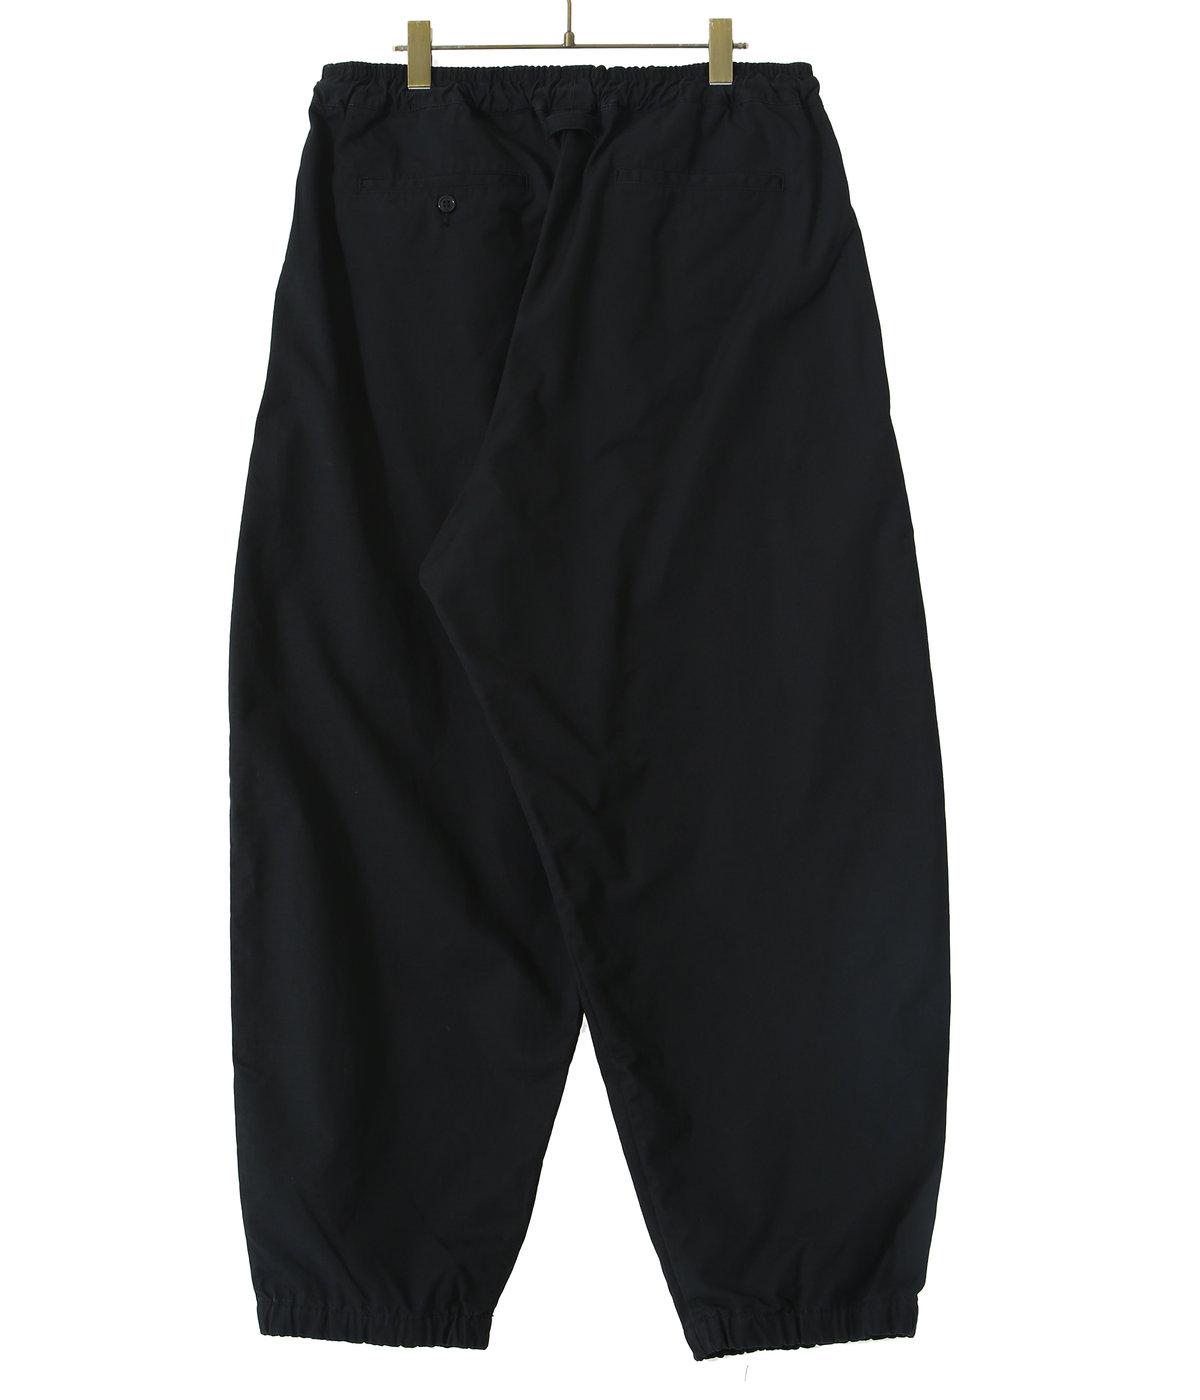 COTTON / NYLON RIPSTOP OVER PANTS